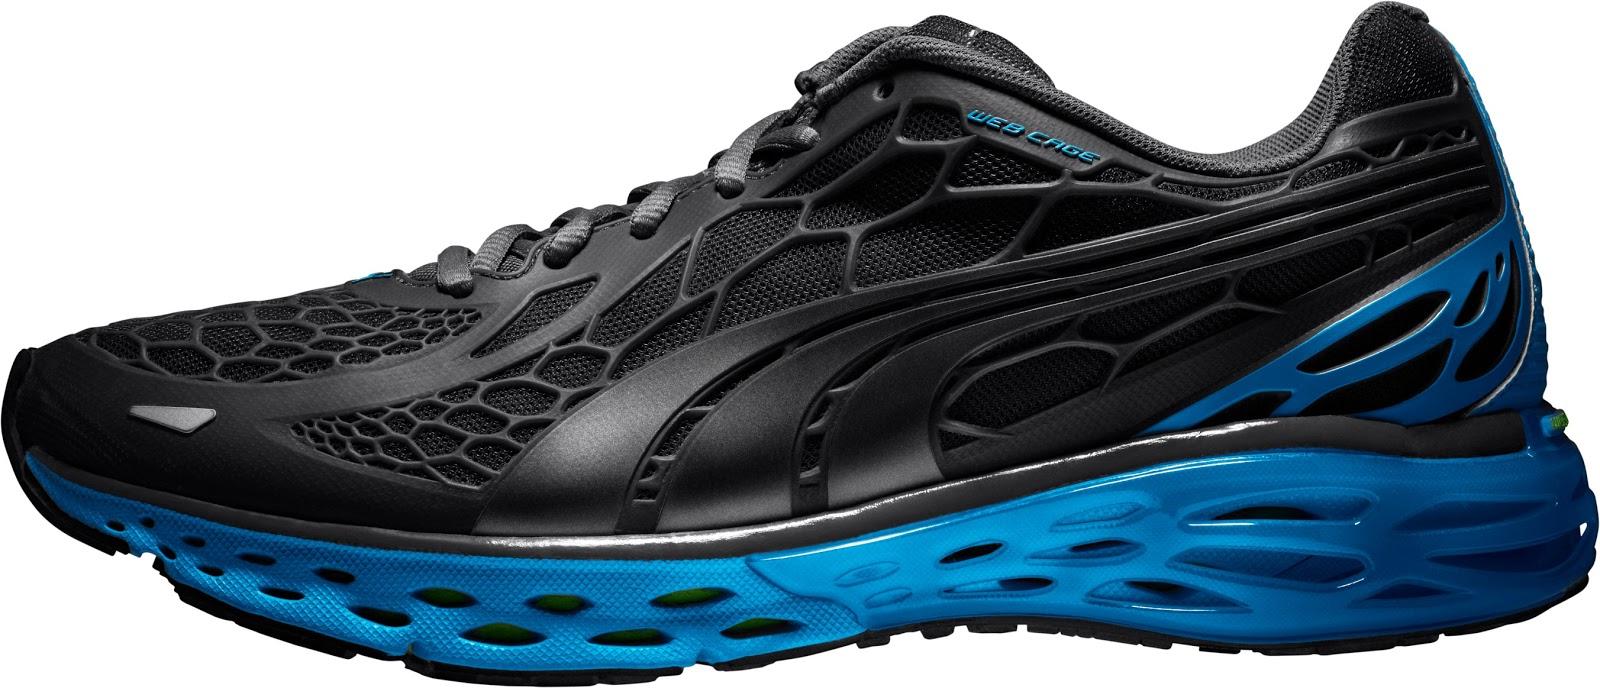 9b9358d0f9e1 Puma BioWeb Elite Running and Training Shoe